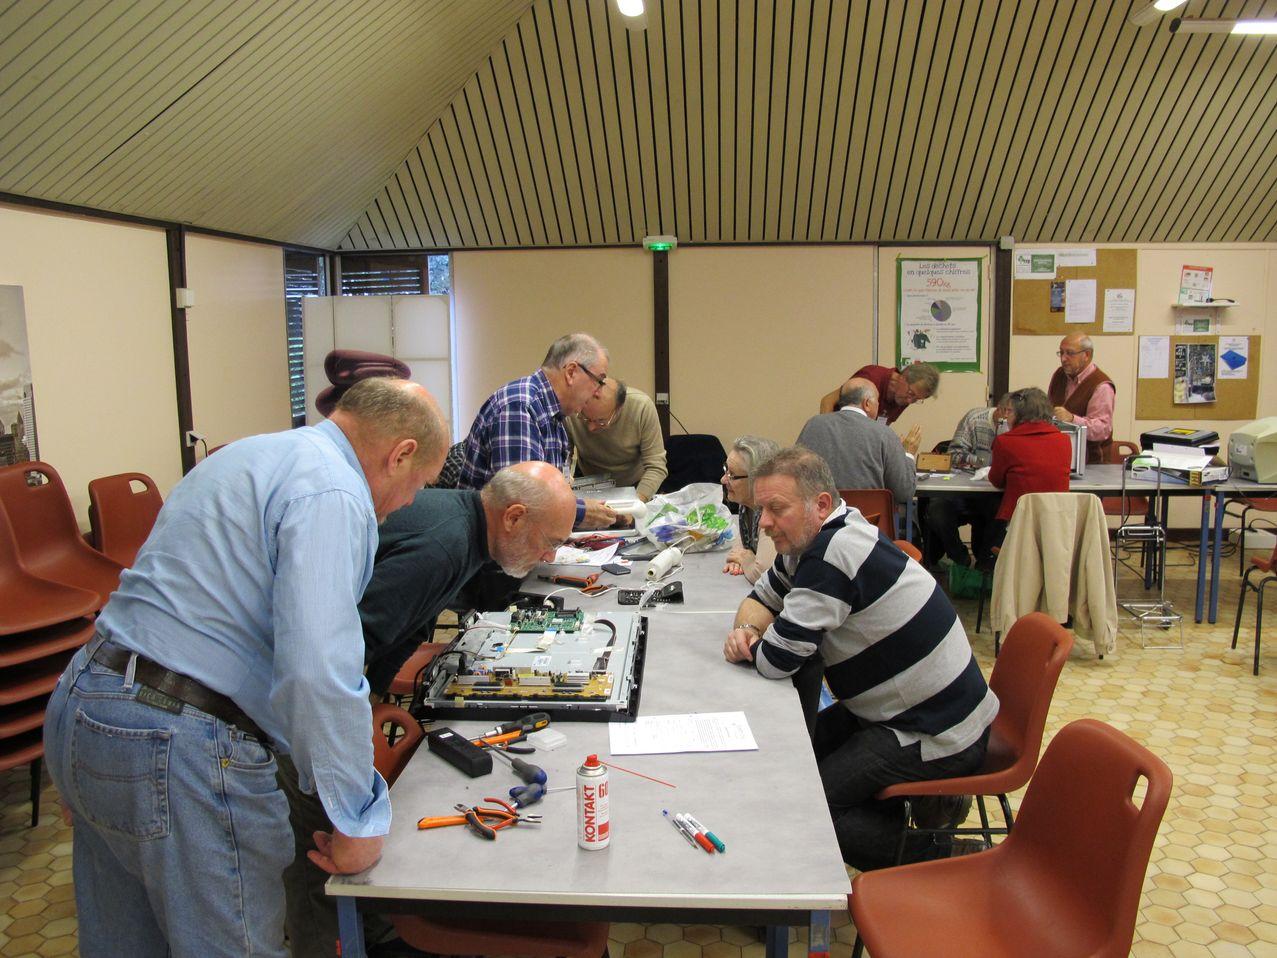 2014-11-25 Repair Café SERD 04_1